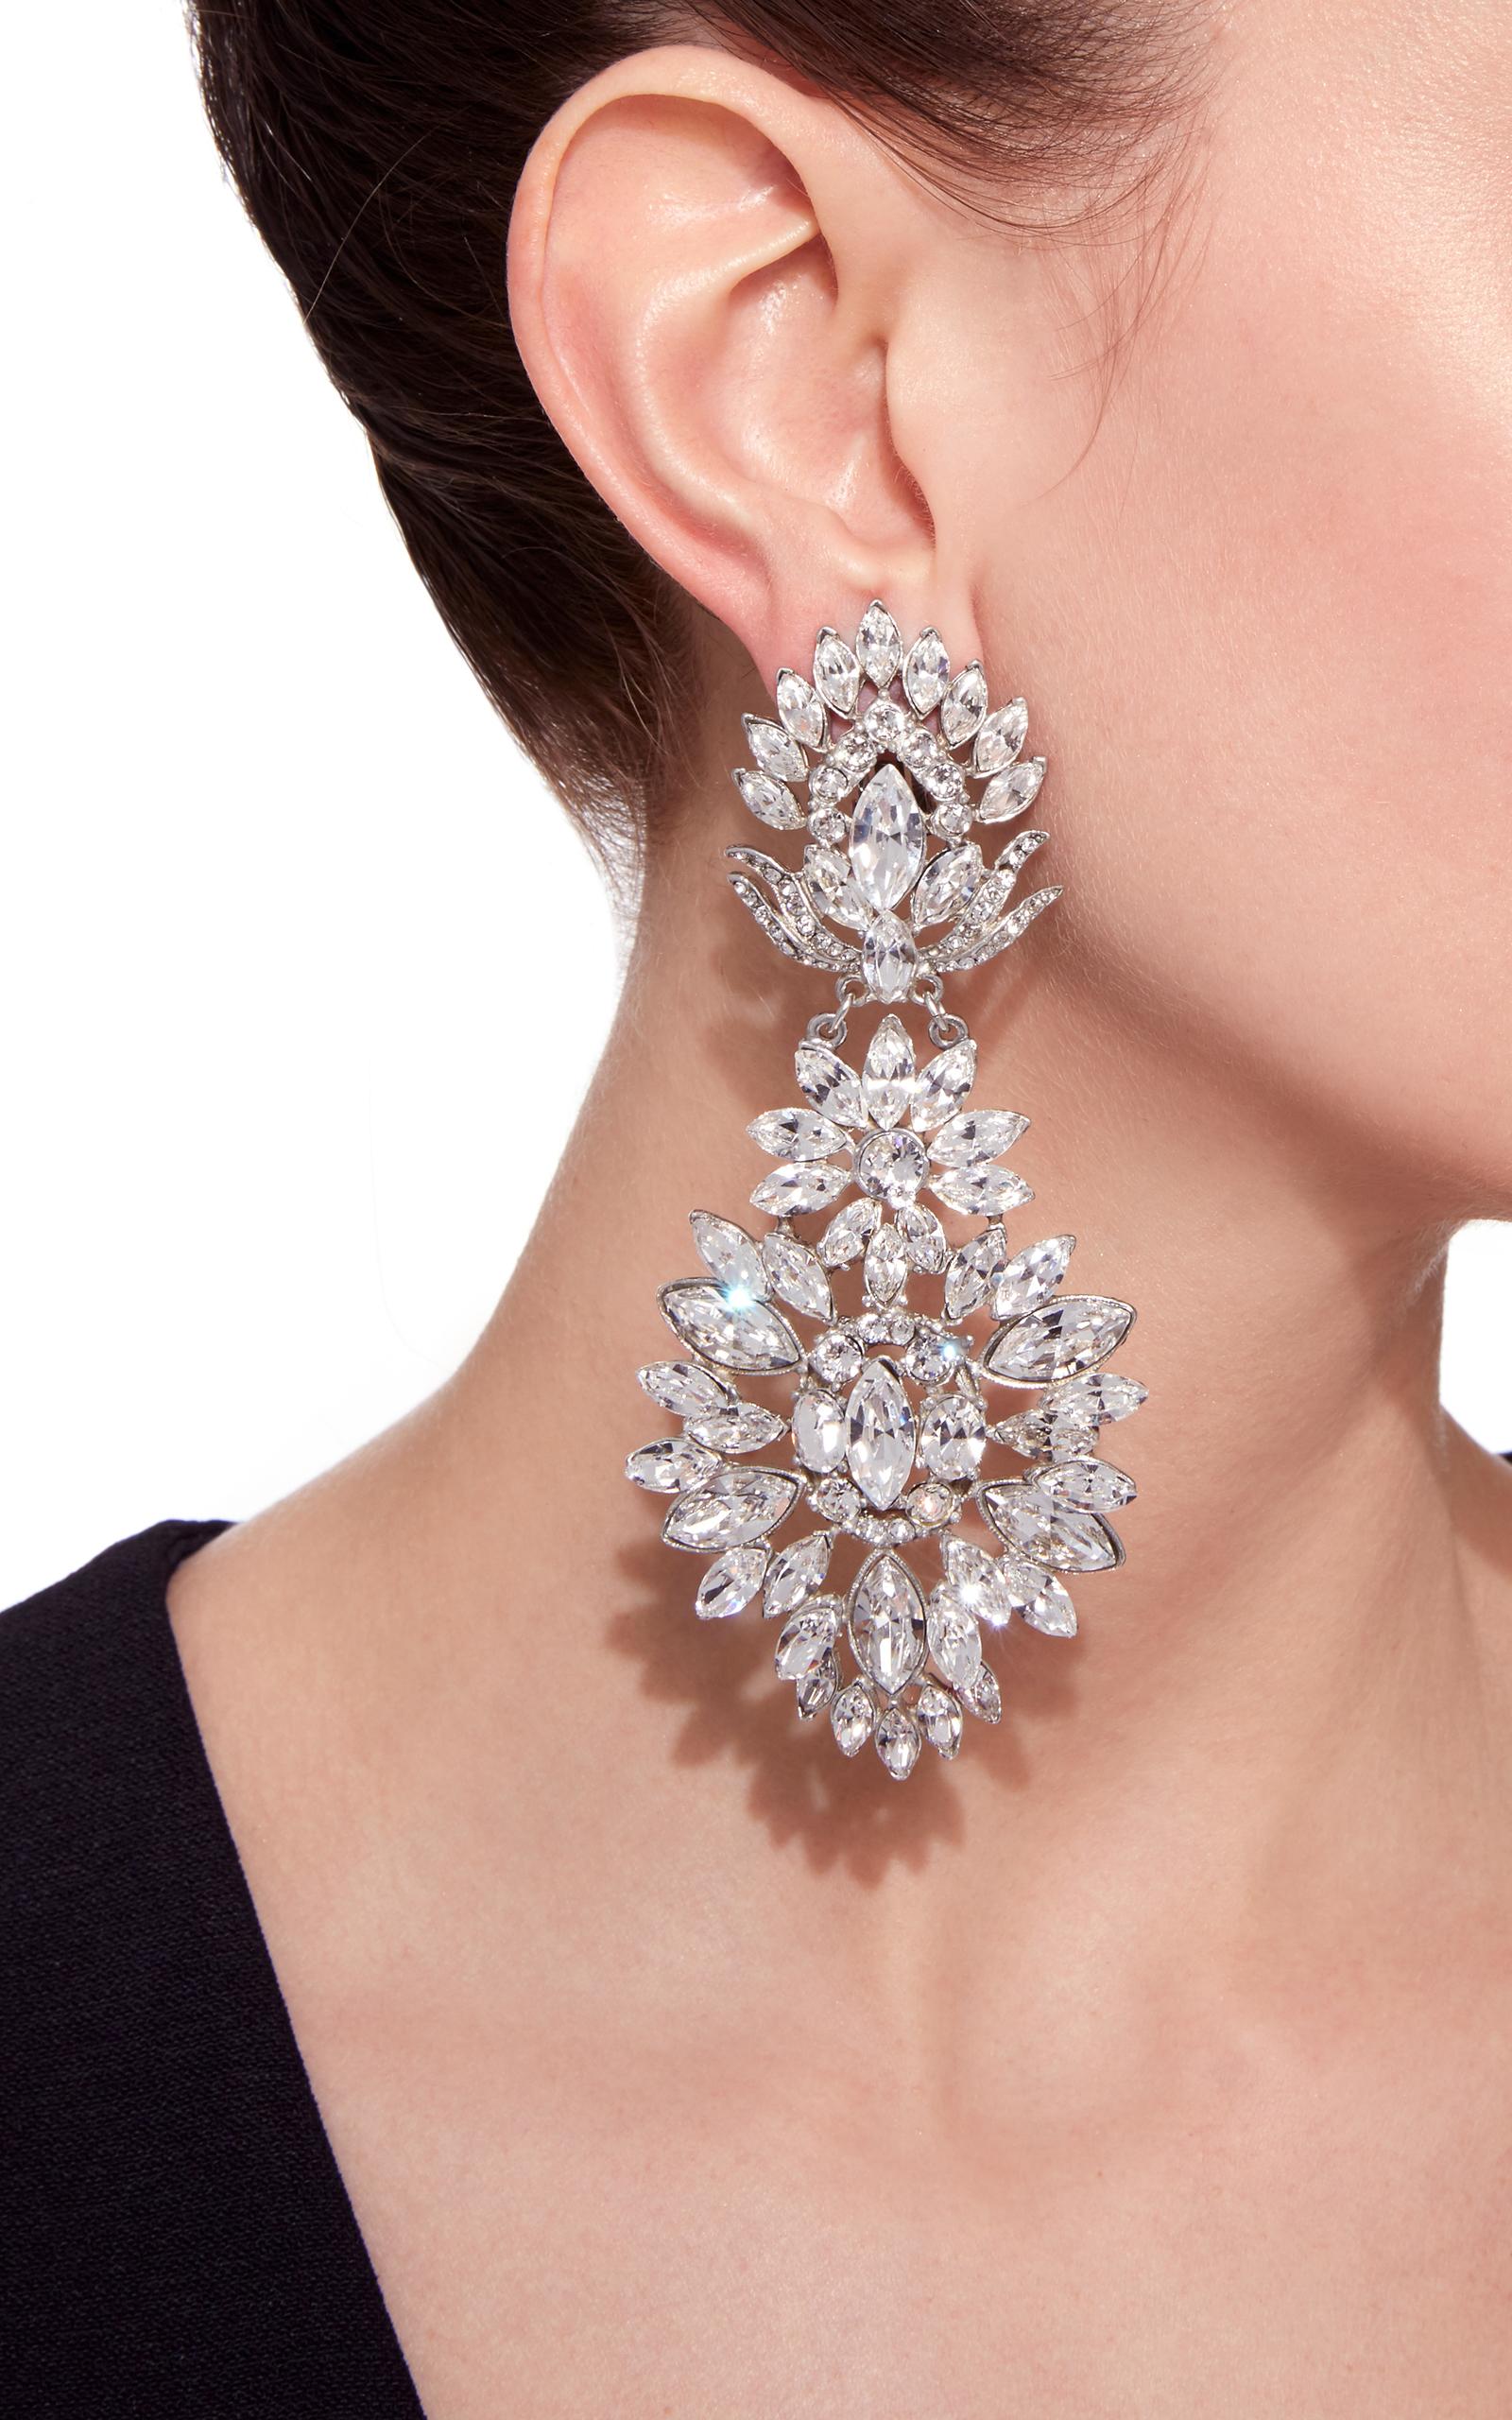 Silver Crystal Large Clip Earrings by Ben Amun | Moda Operandi